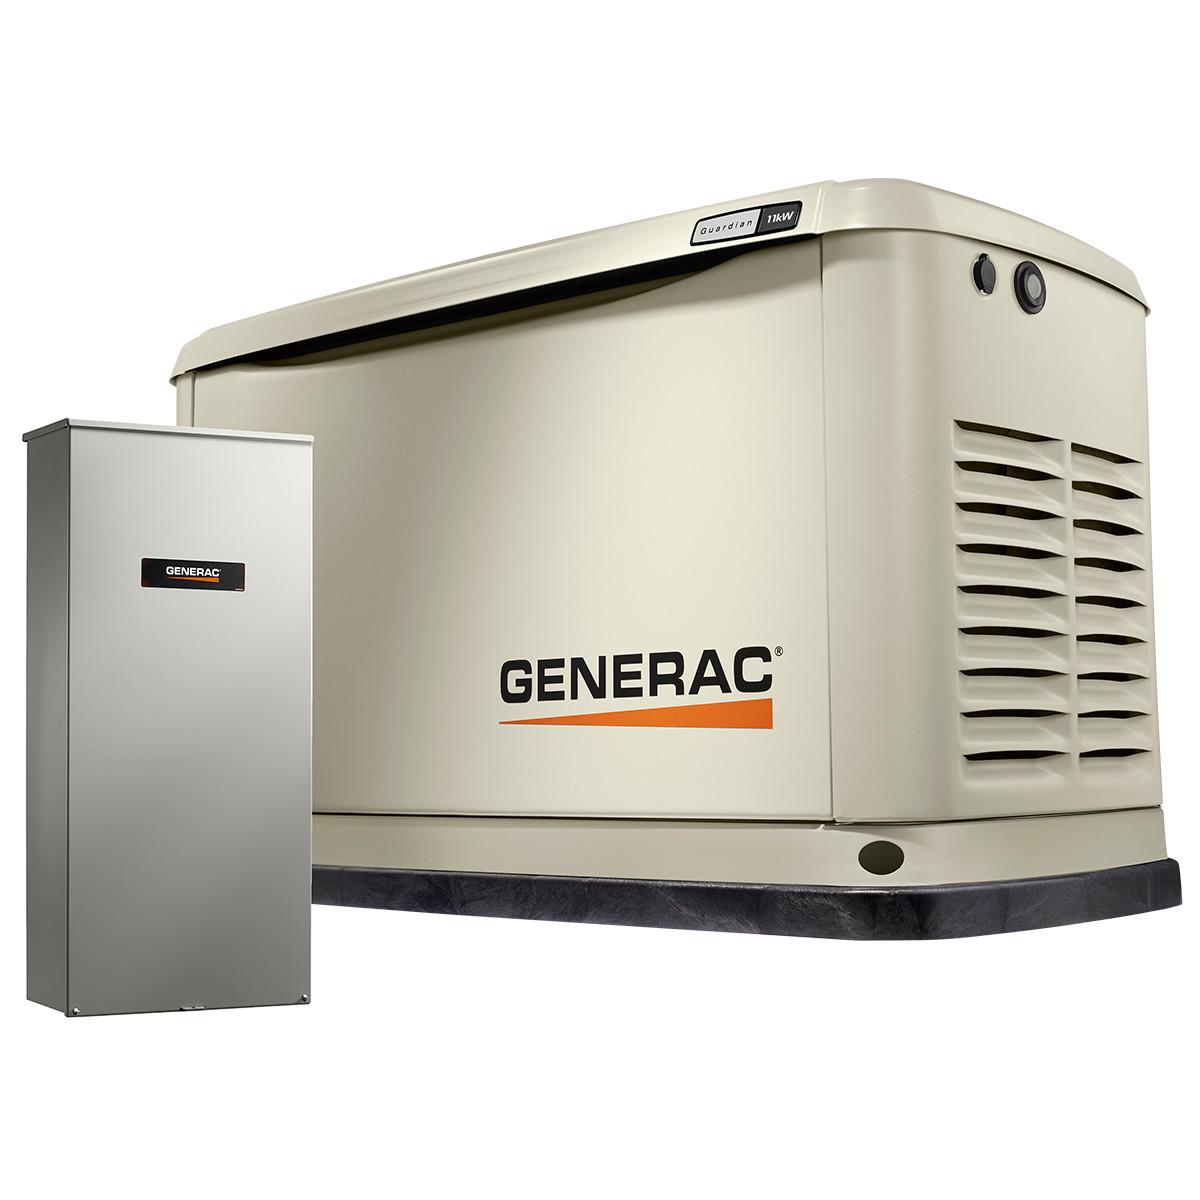 Generac 7033 11kW Guardian Generator with Wi-Fi & 200A SE Transfer Switch